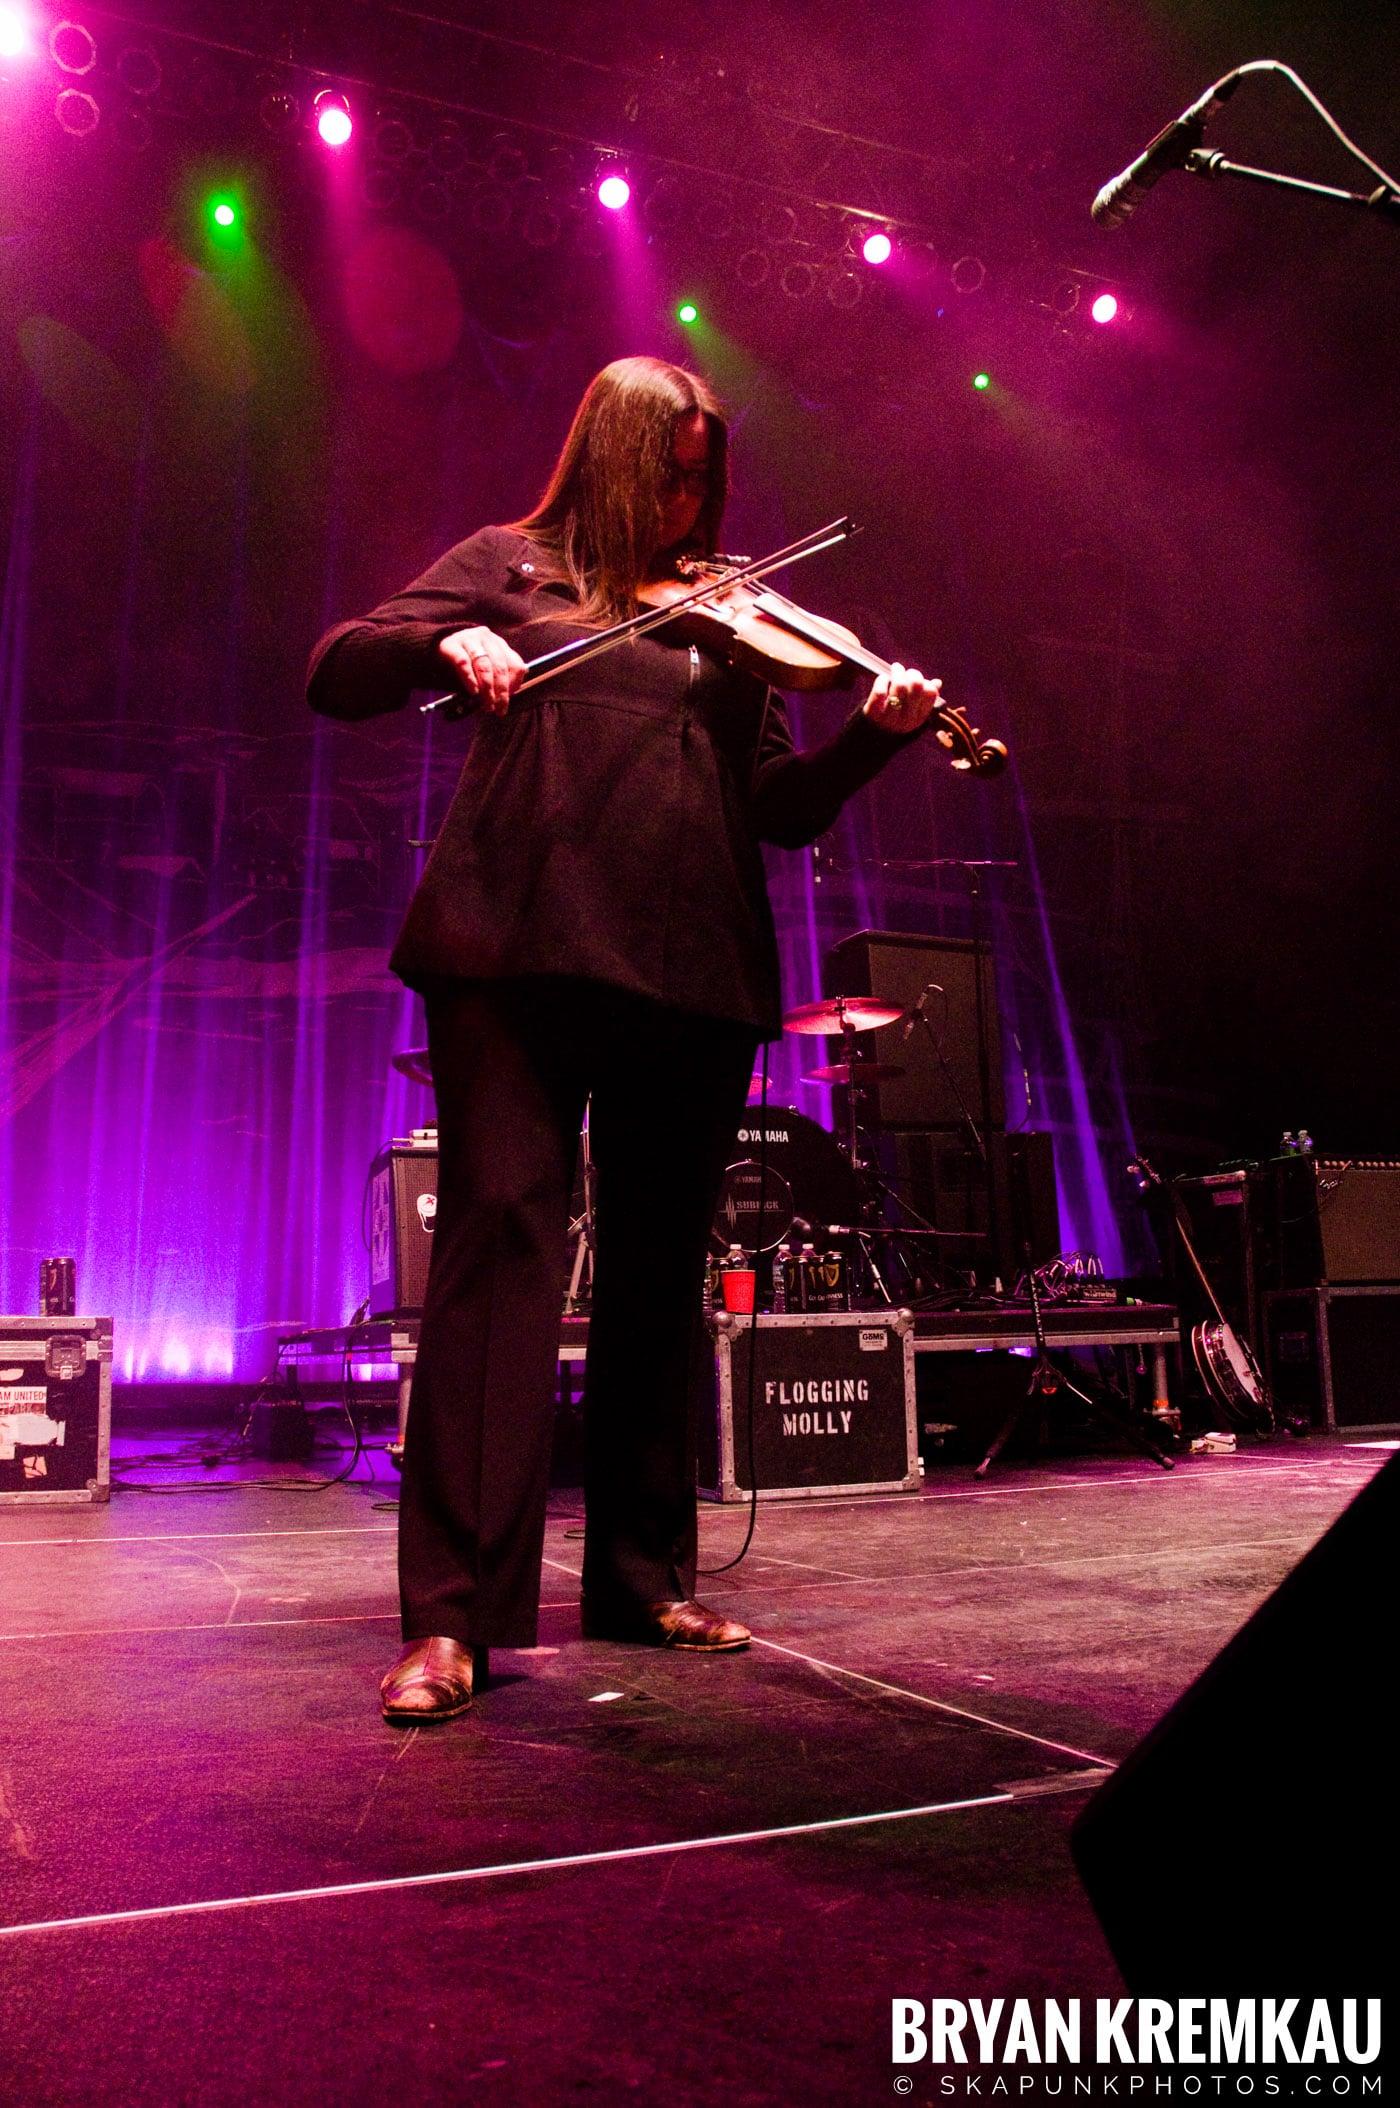 Flogging Molly @ Hammerstein Ballroom, NYC - 3.2.10 (8)